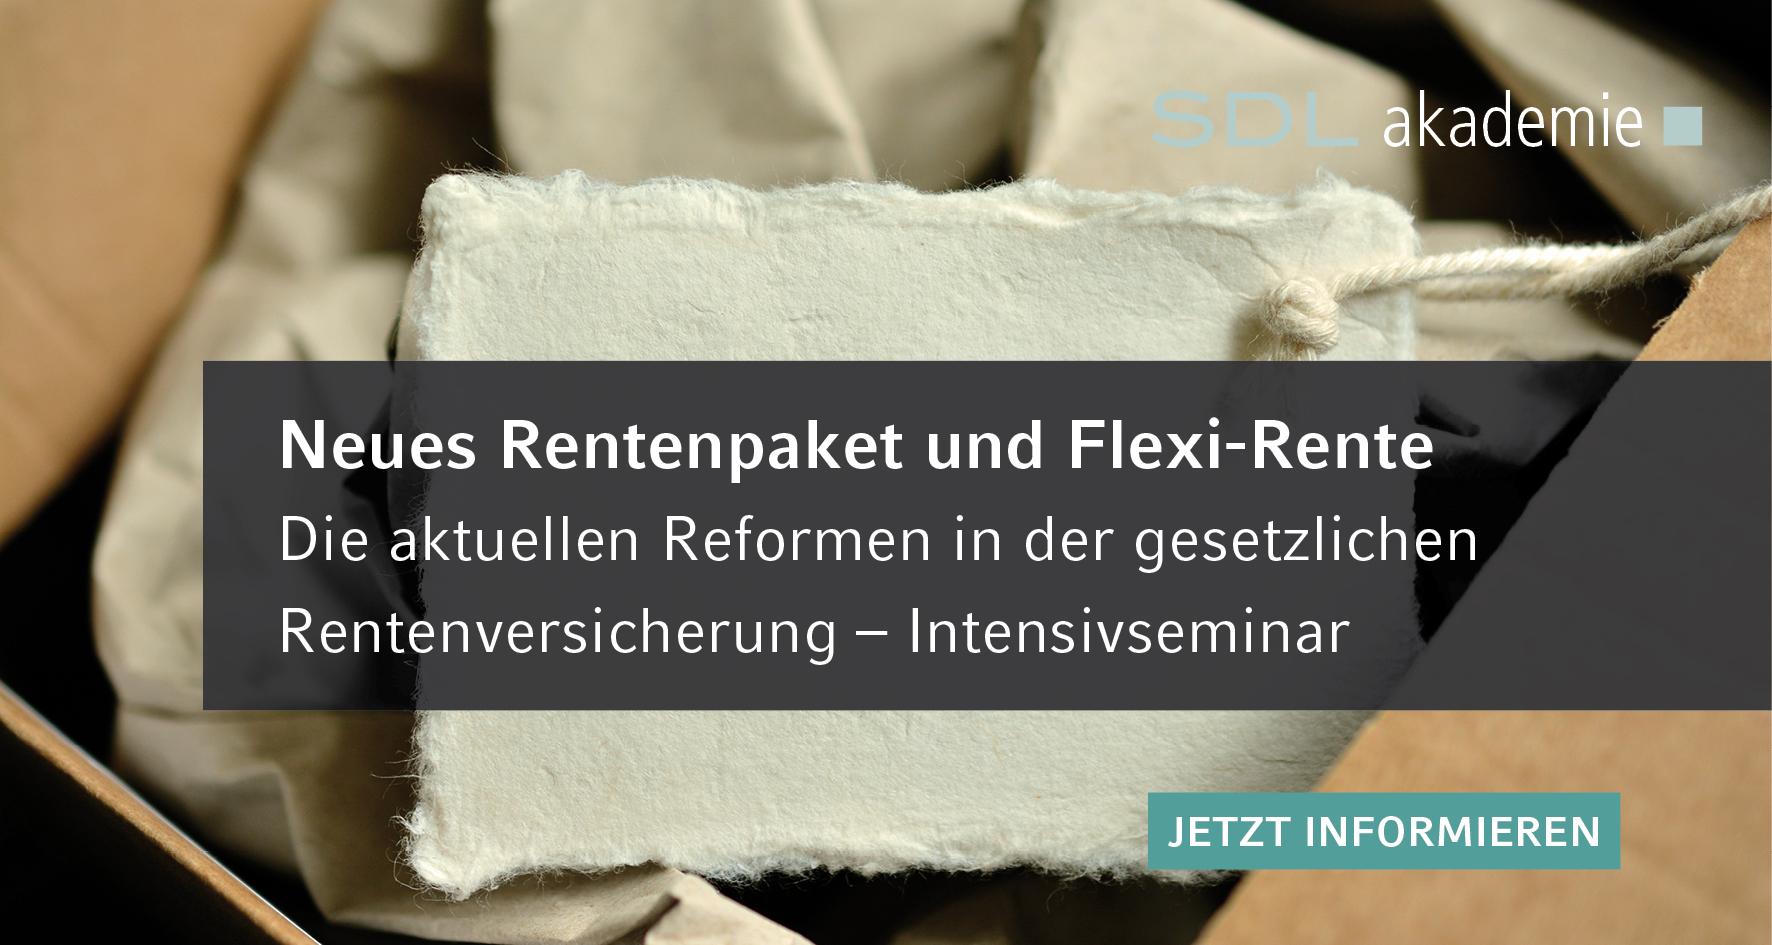 SDL Akademie neues Rentenpaket und Flexi-Rente